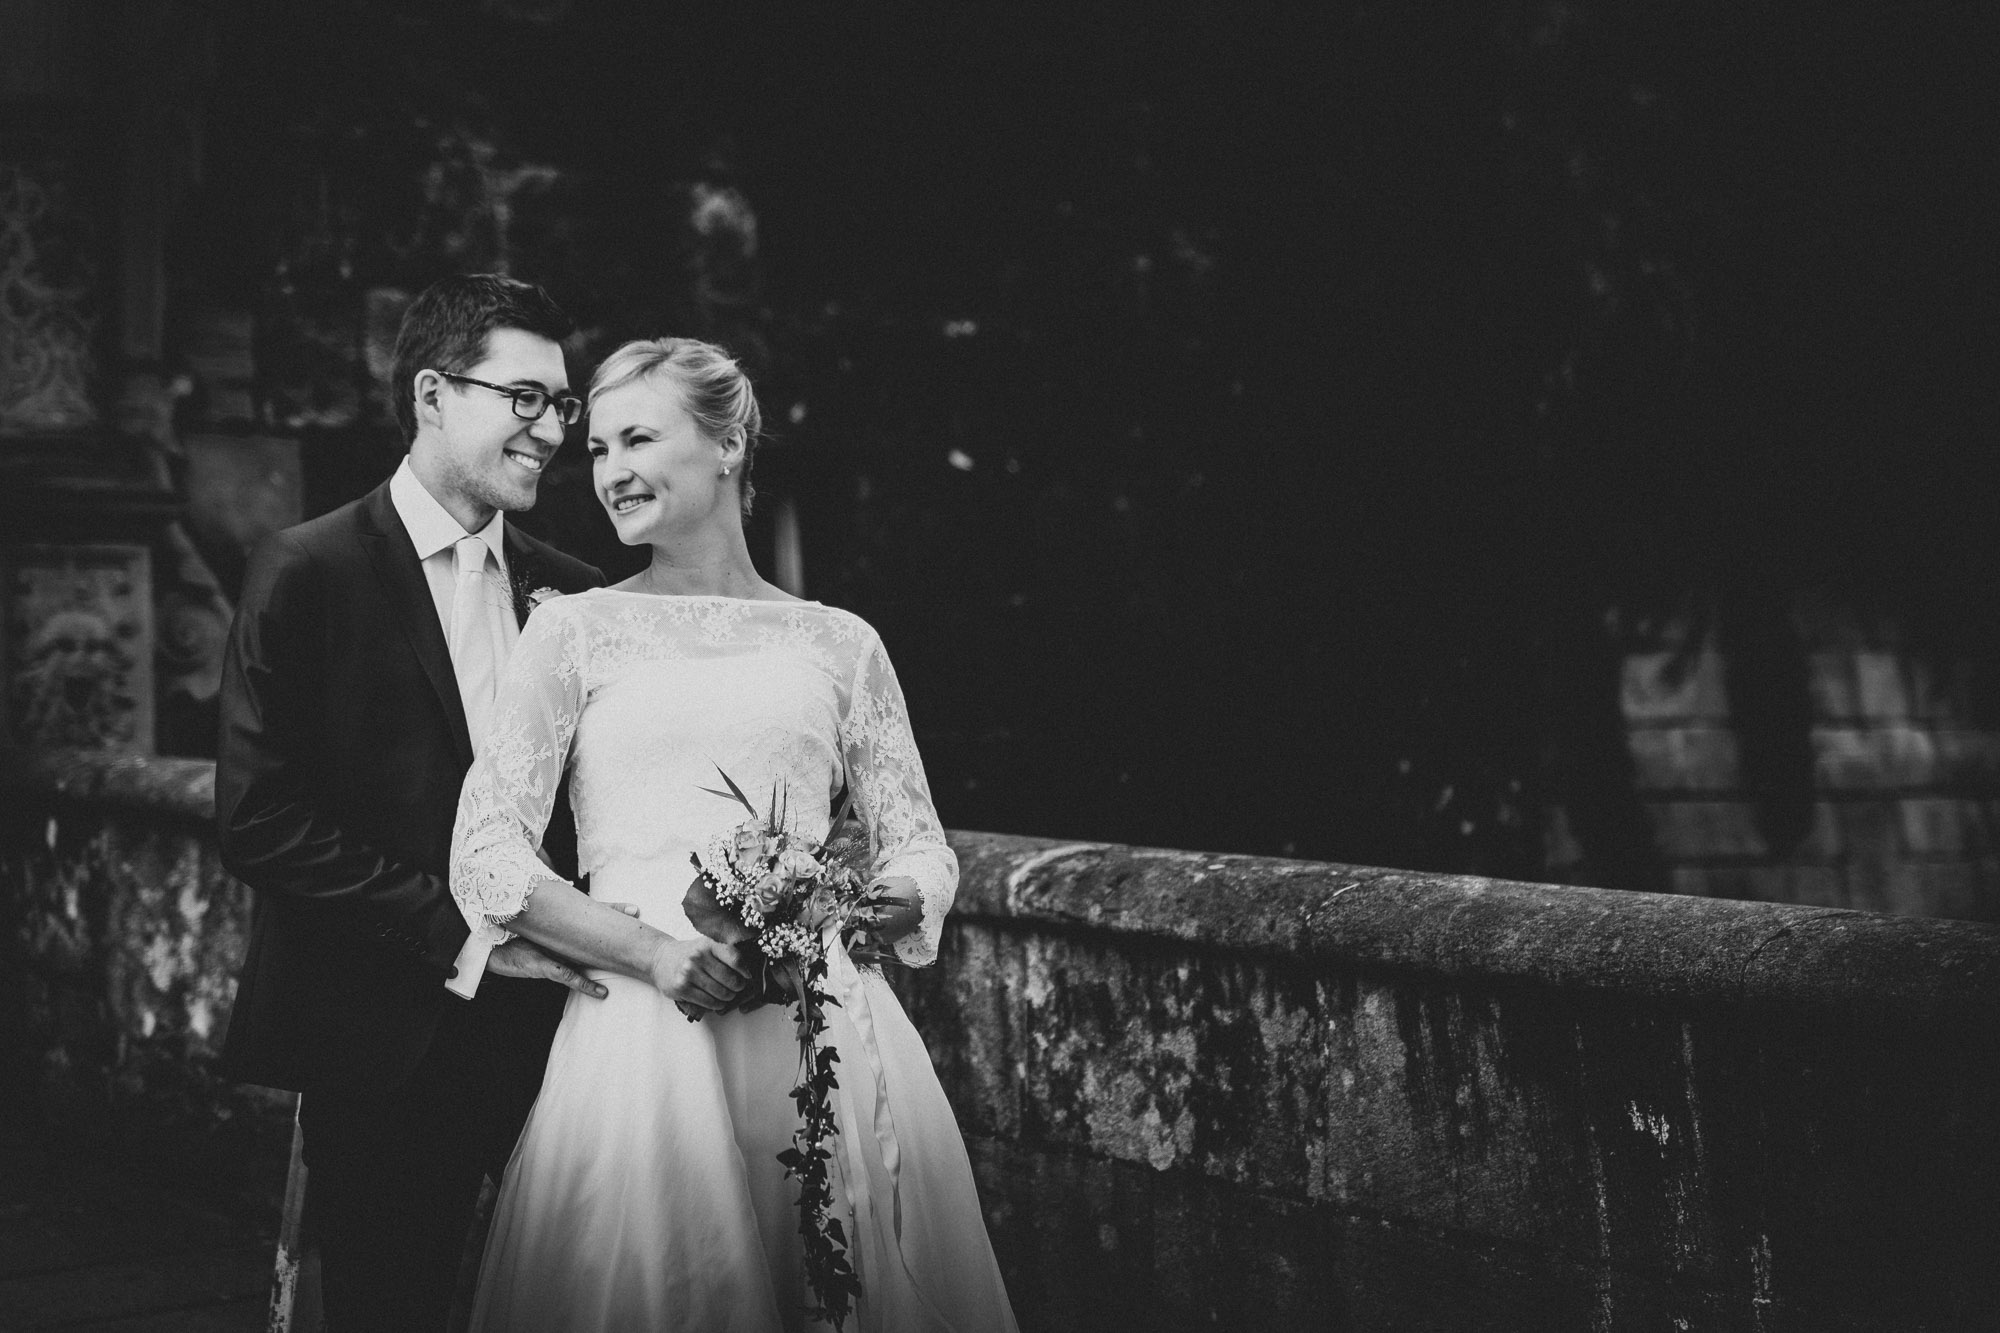 Hochzeitsfotografie-Tuebingen-Doro-Stefan-6